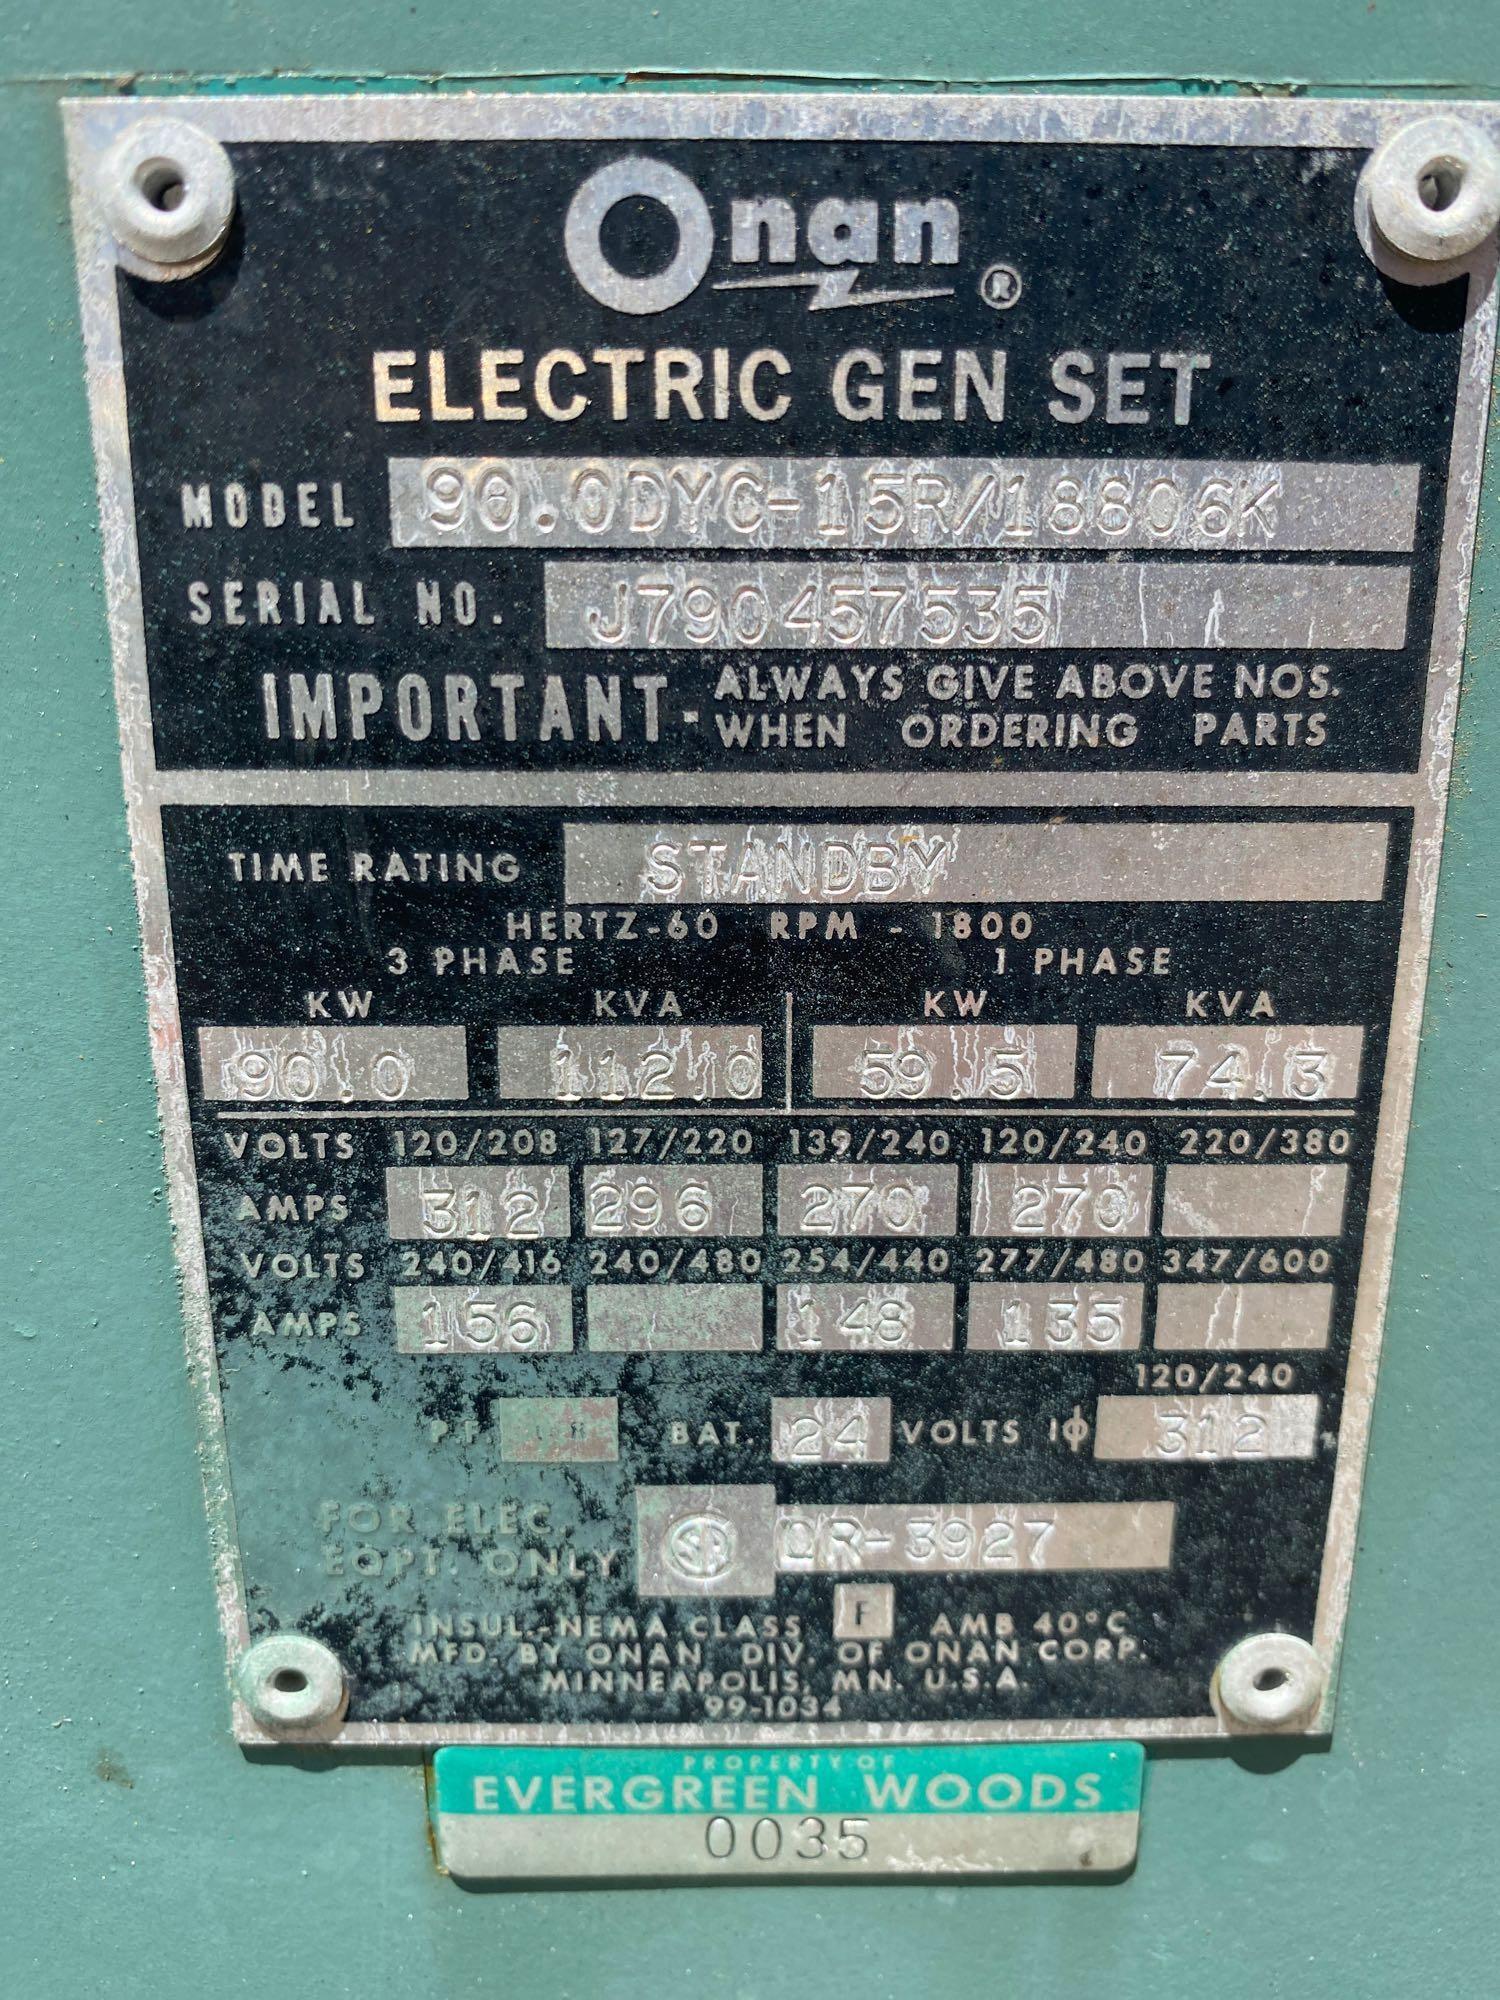 ONAN 90 DYC GENERATOR, 90 KW, 112KVA, 1085 HOURS SHOWING - Image 11 of 11